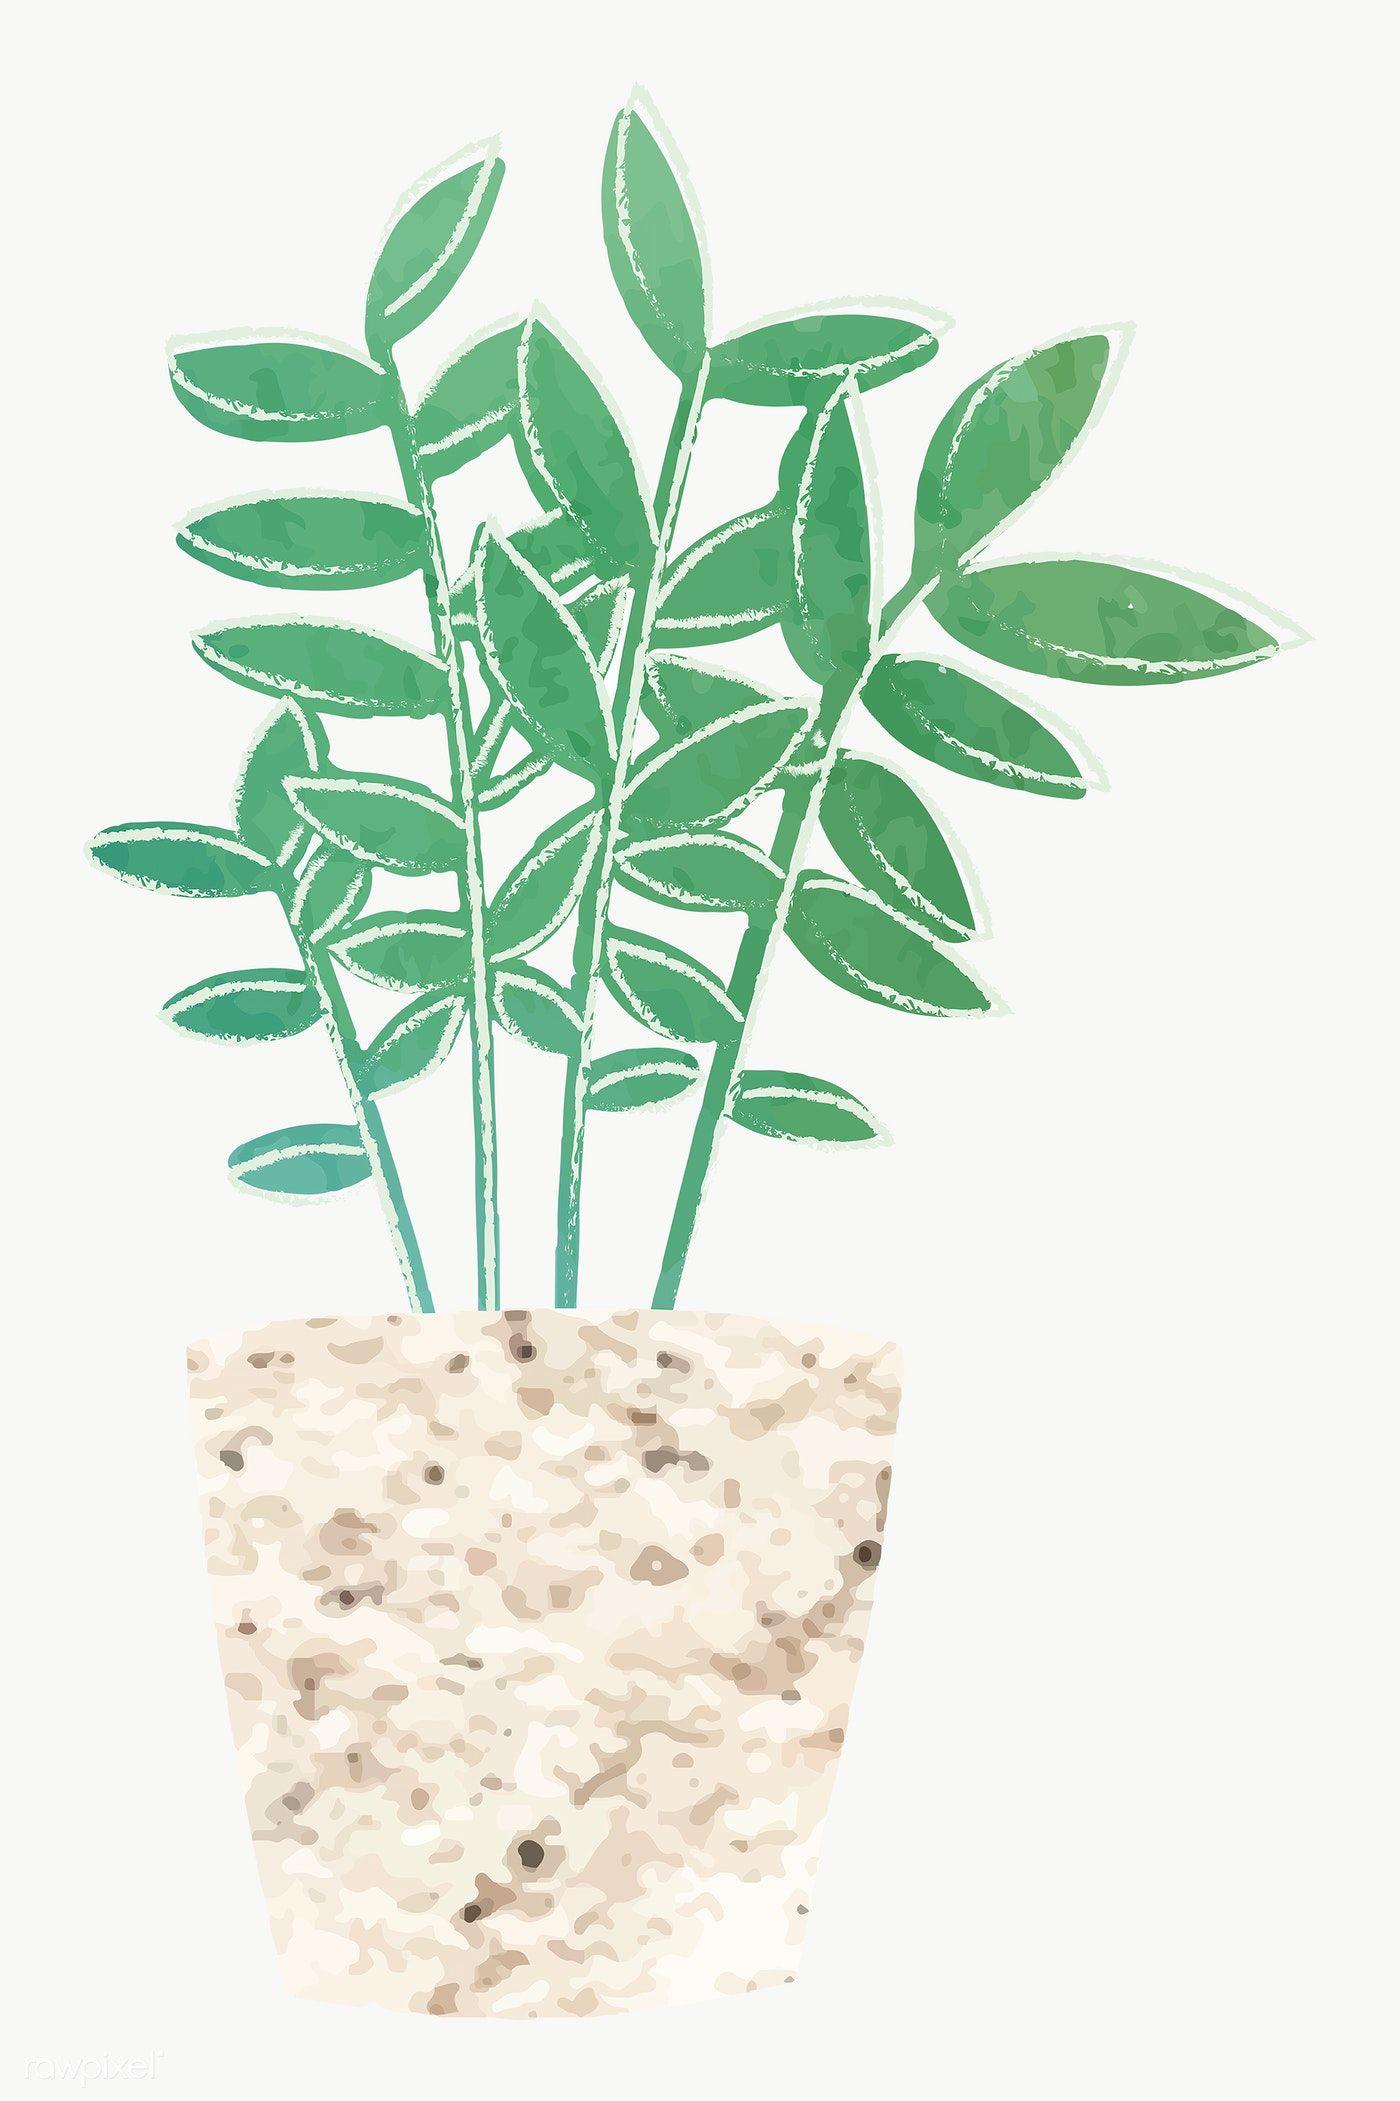 Download Premium Png Of Watercolor Tropical Potted Plant 2023106 Plants Cactus Design Aloe Vera Plant